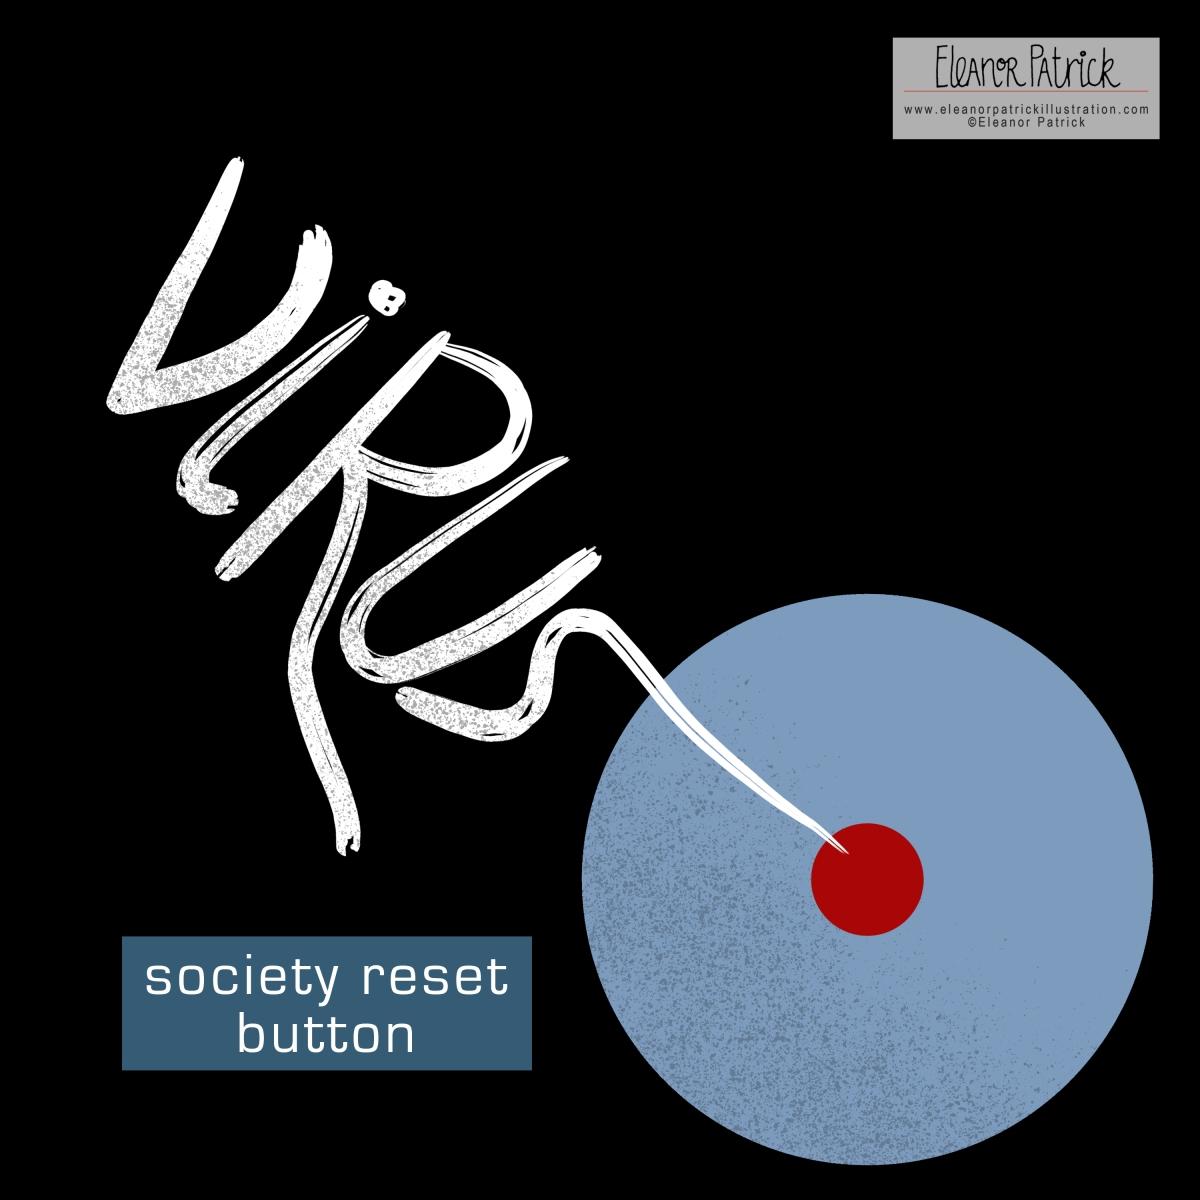 society reset button